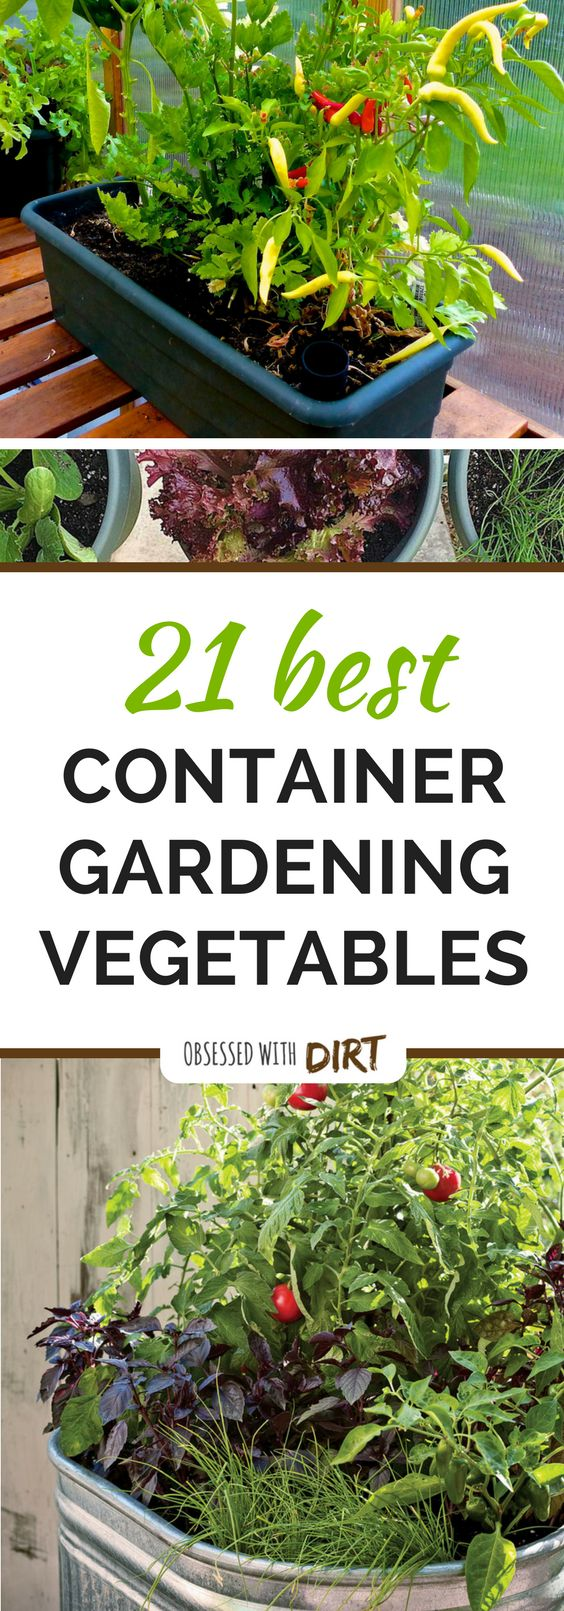 202 best indoor garden images on pinterest backyard ideas el paso and enchanted garden. Black Bedroom Furniture Sets. Home Design Ideas